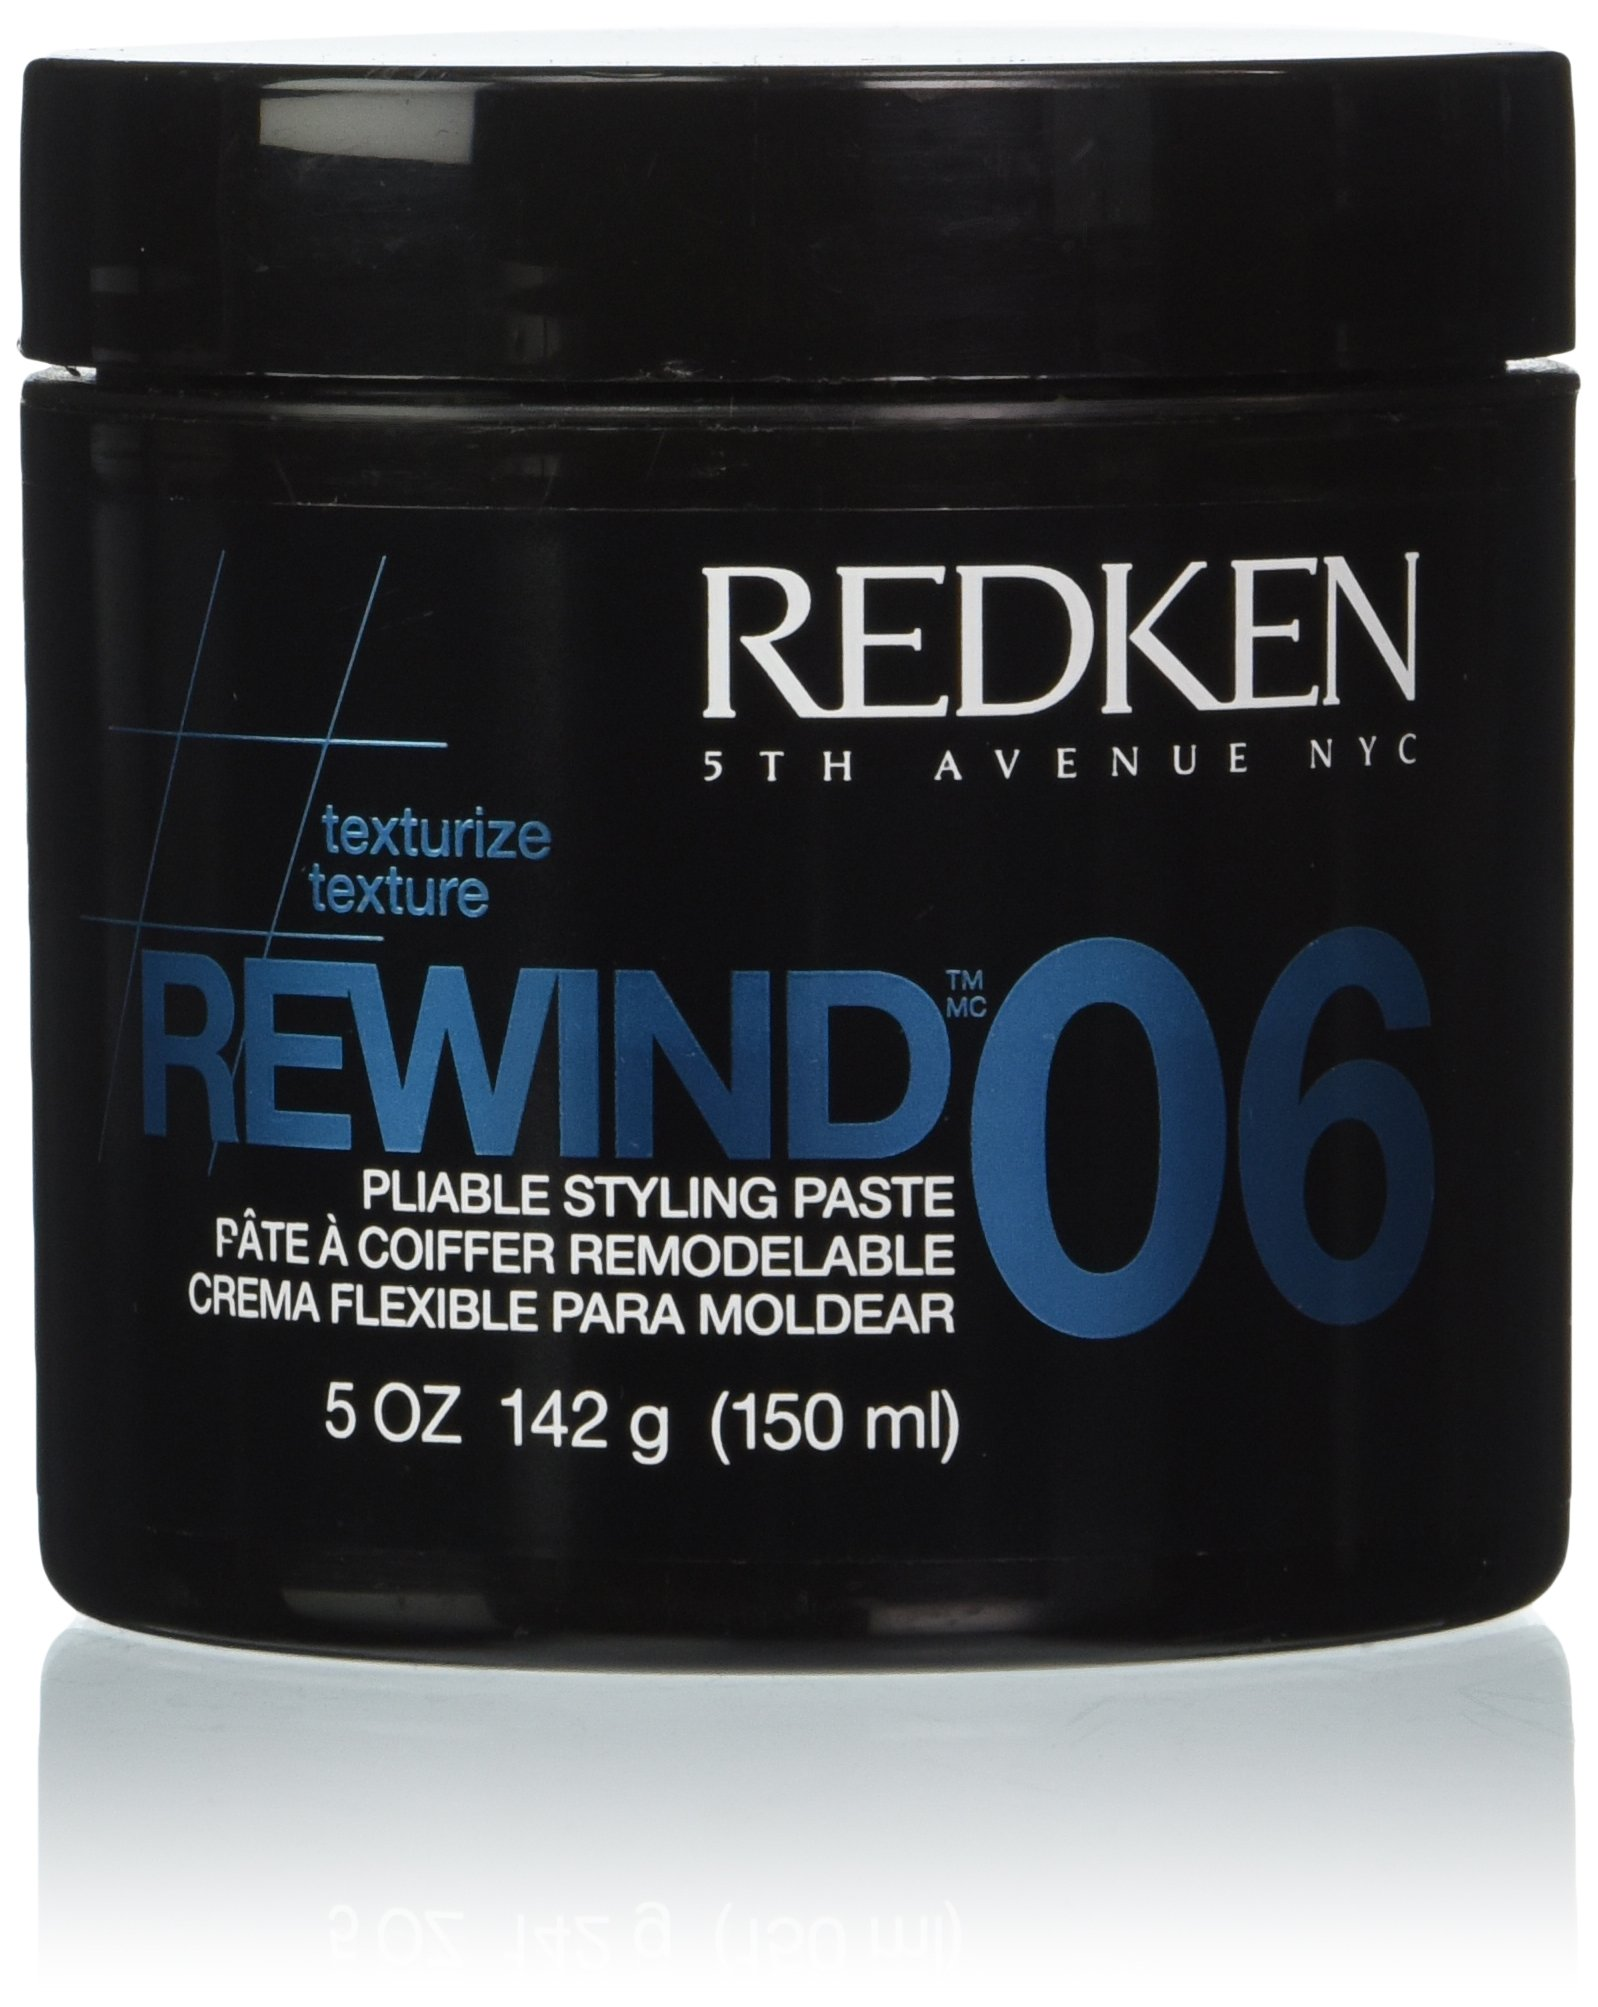 Redken Rewind 06 Pliable Styling Paste 5-Ounces Bottle by REDKEN